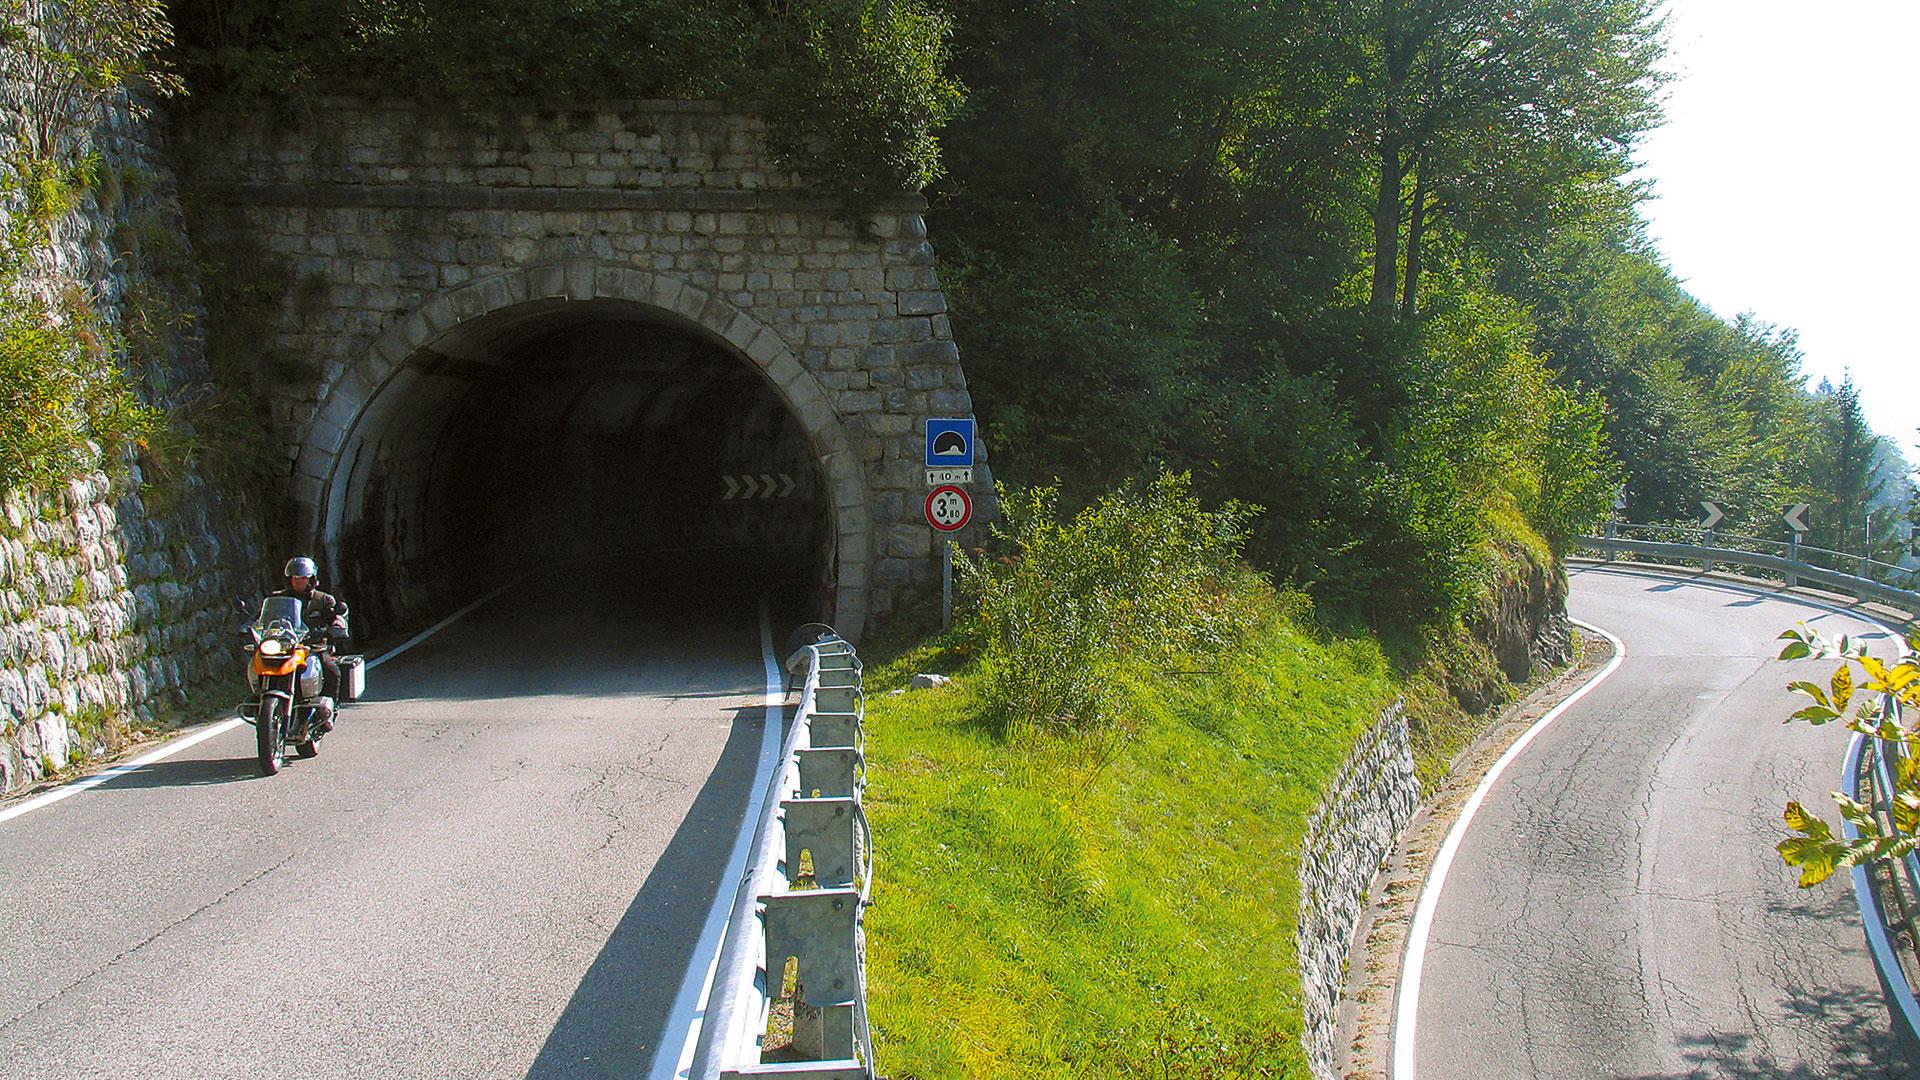 Von Bozen nach Riva del Garda